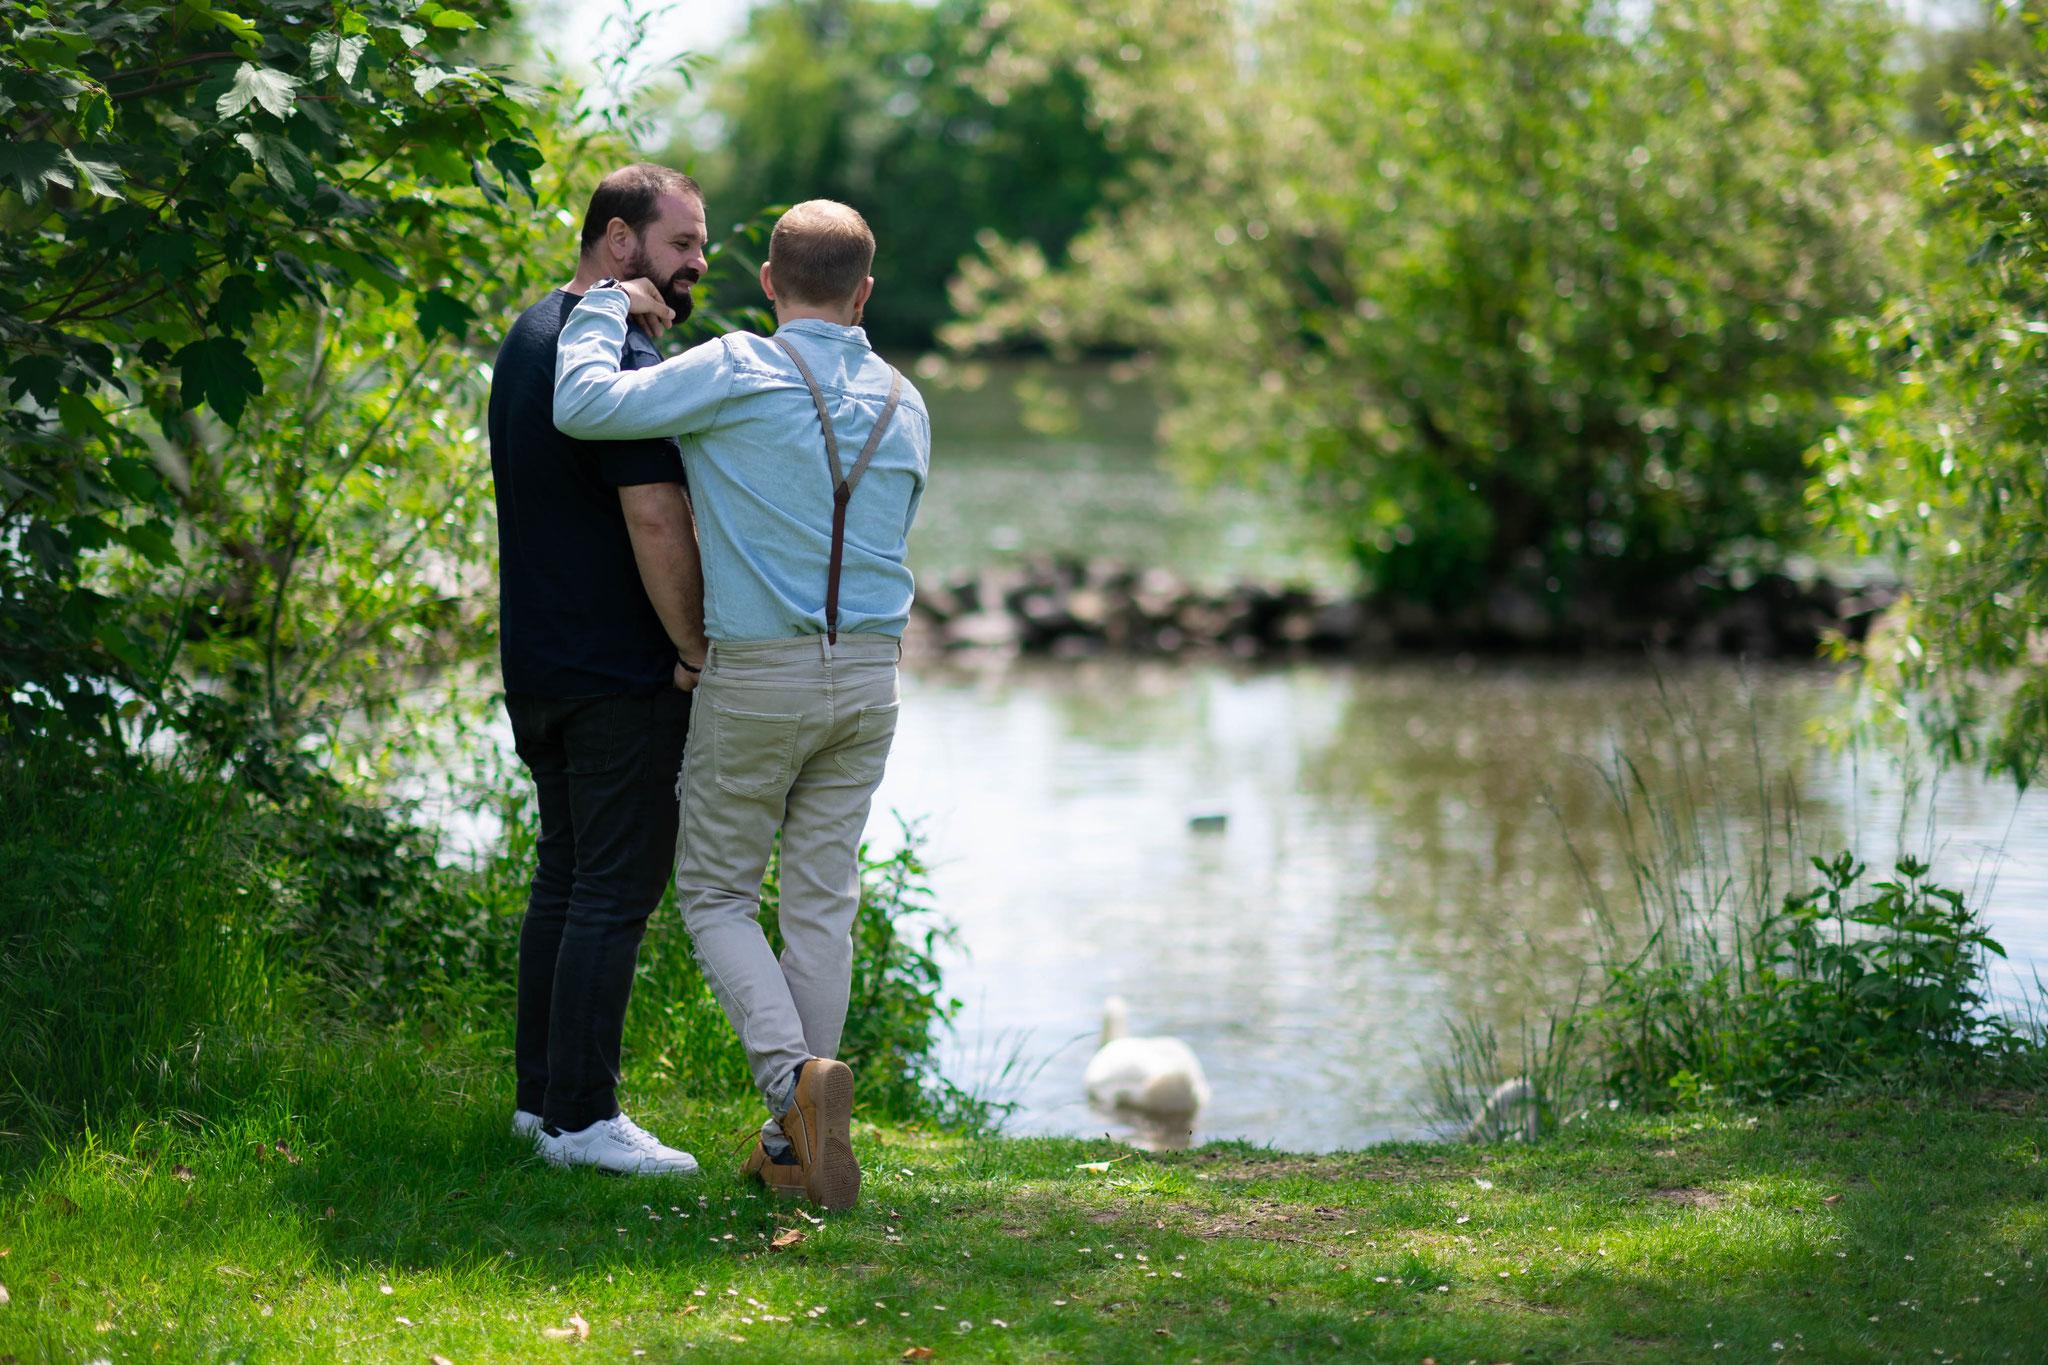 Engagement-Shooting für Paare in Hanau am Main